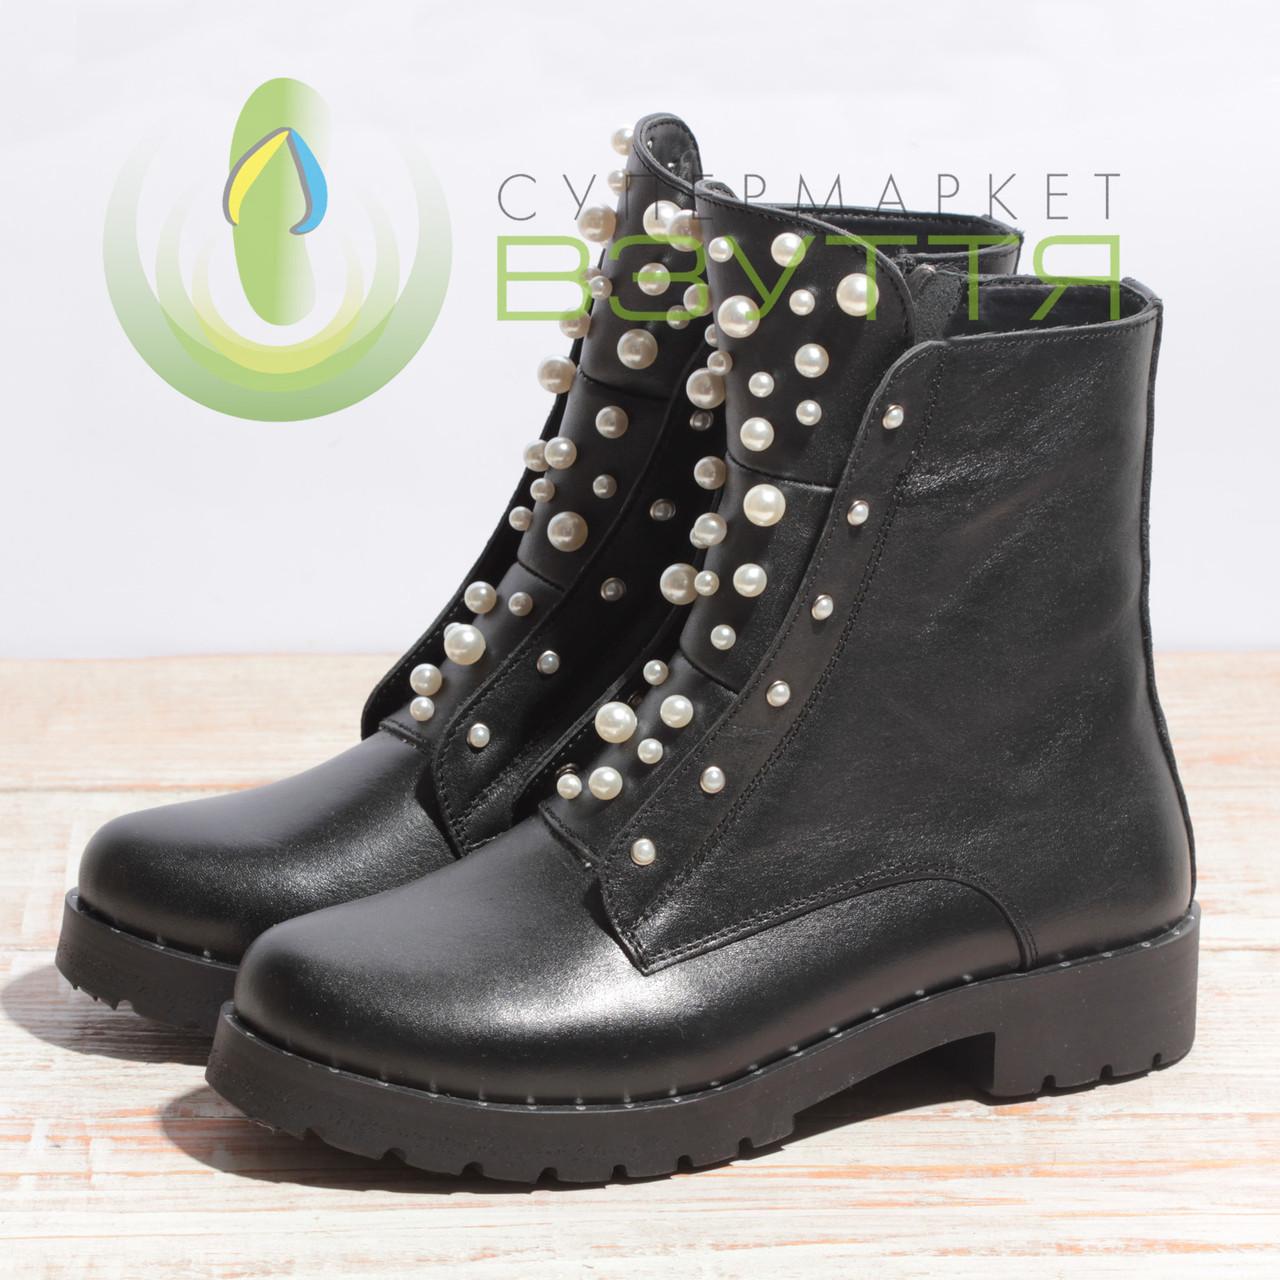 Ботинки демисезонные  кожаные женские Velutto 576  36,38 размеры